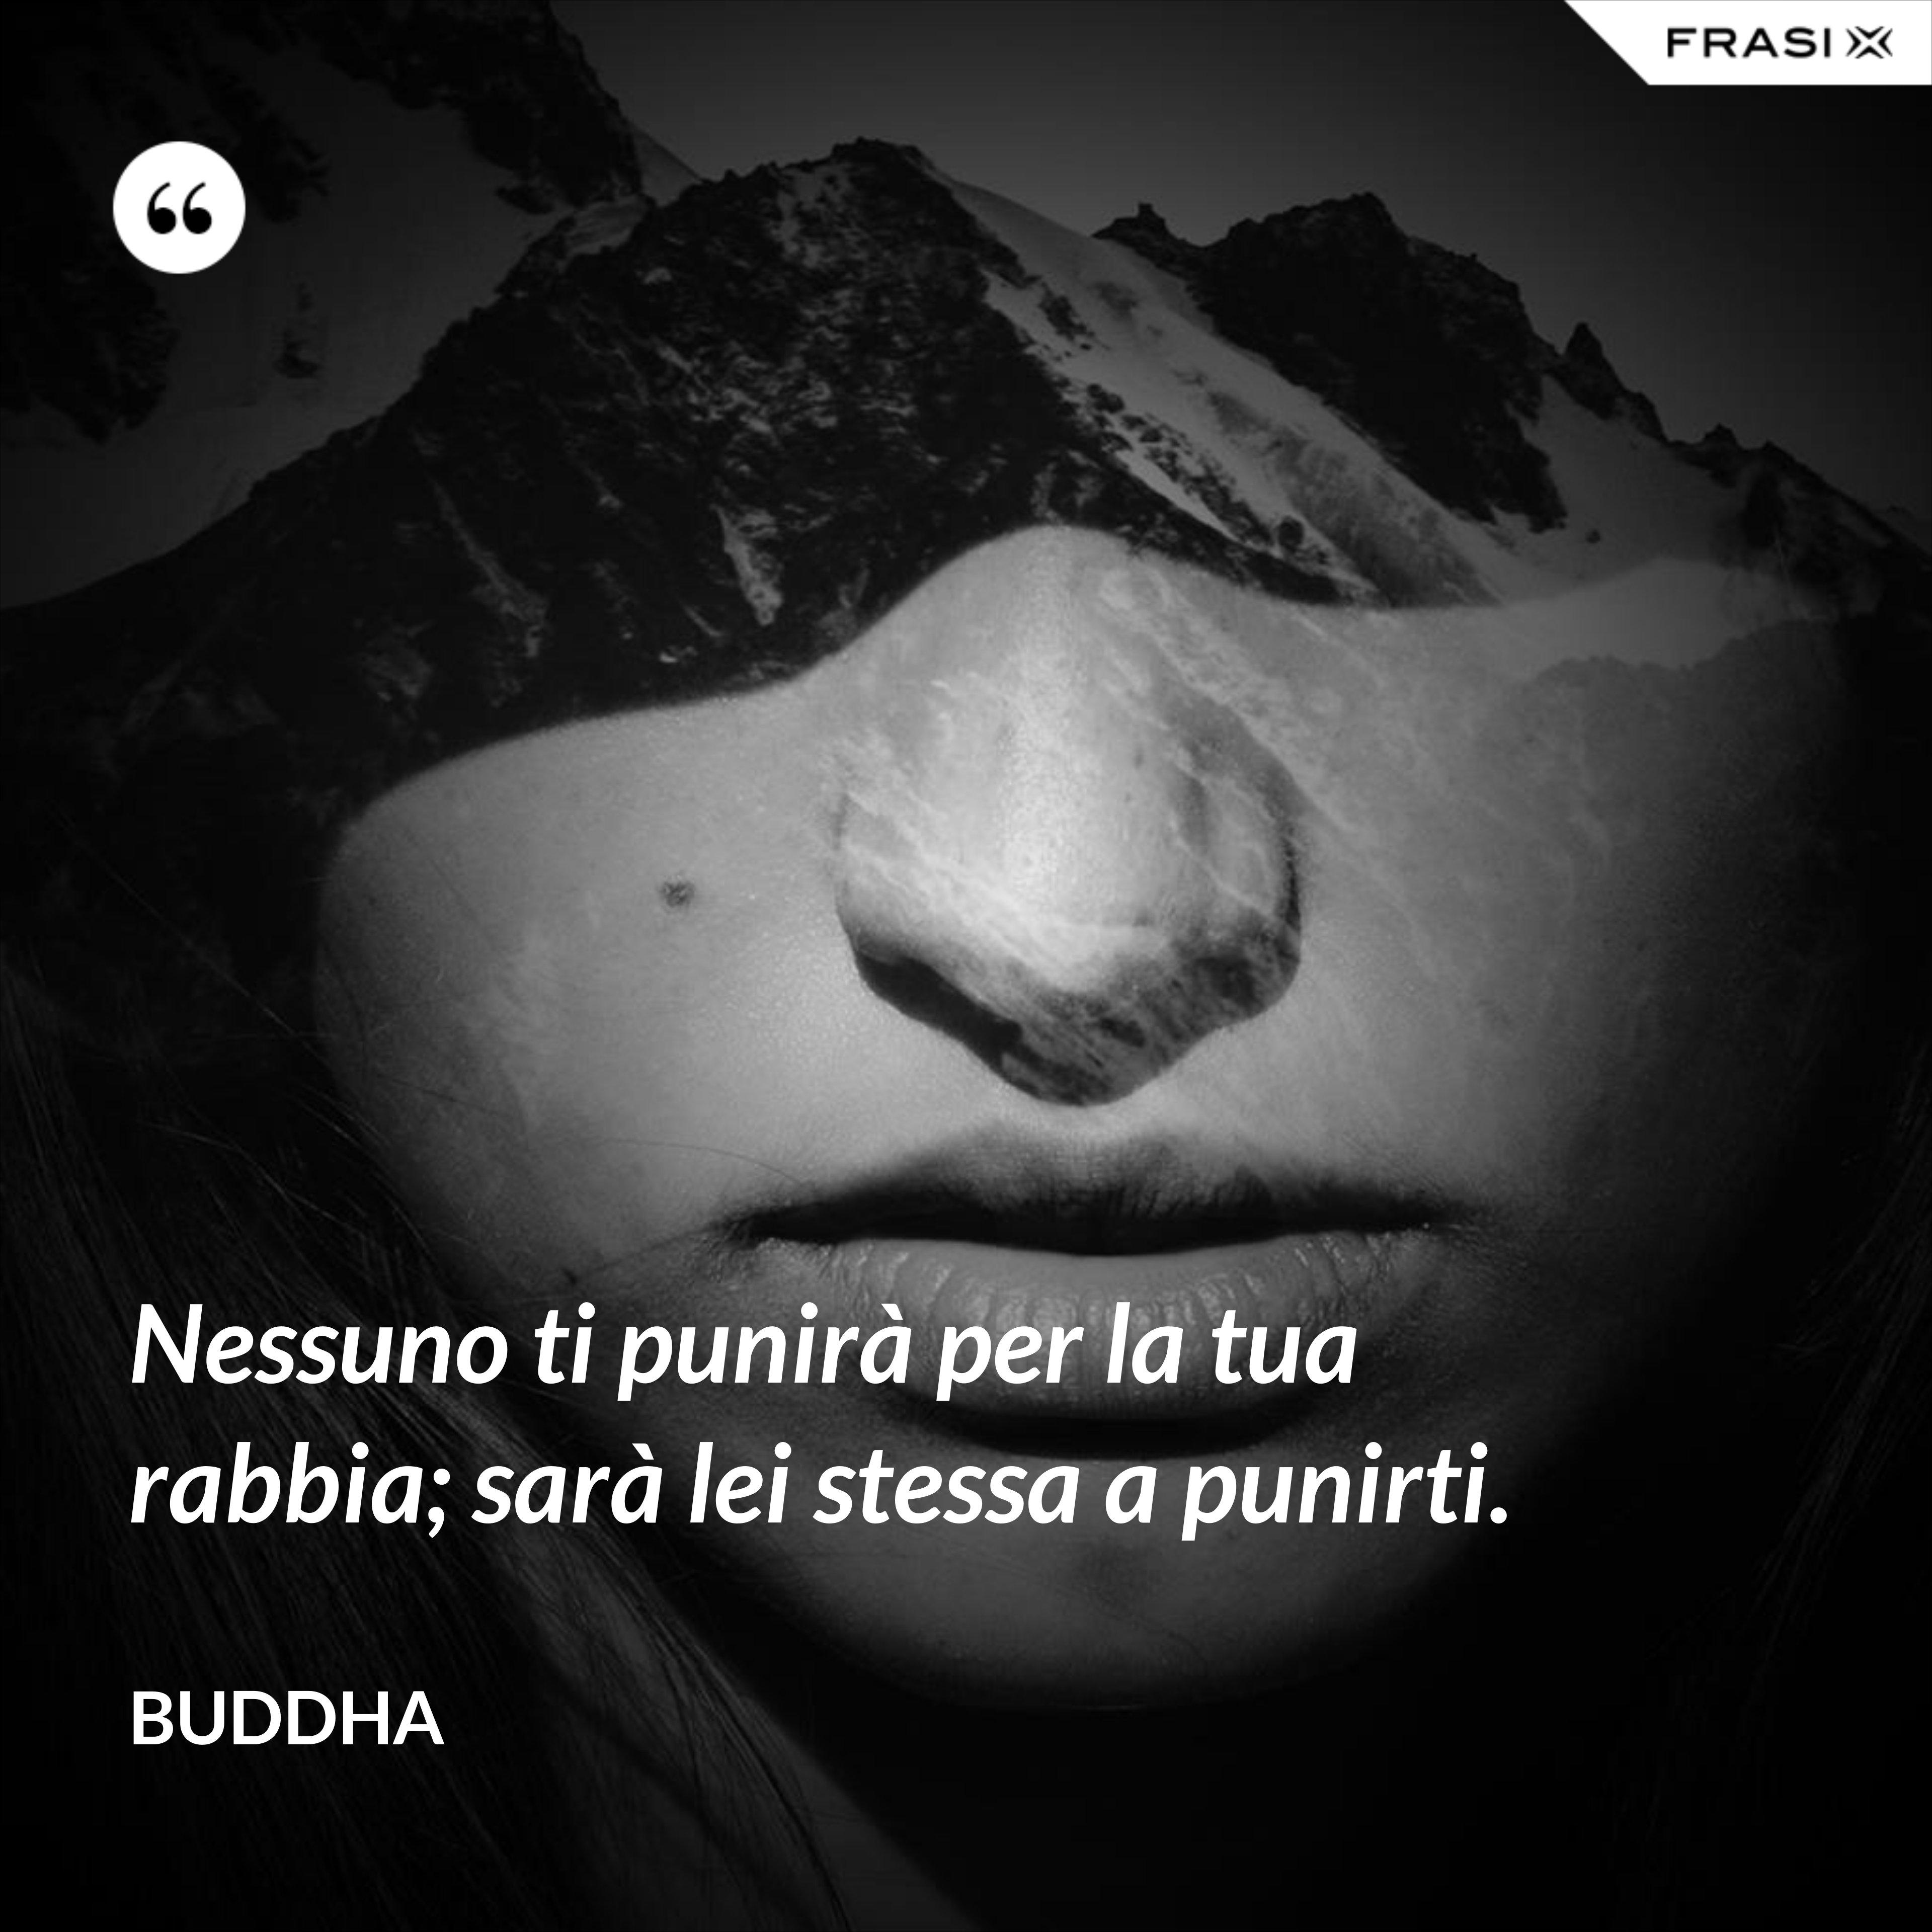 Nessuno ti punirà per la tua rabbia; sarà lei stessa a punirti. - Buddha